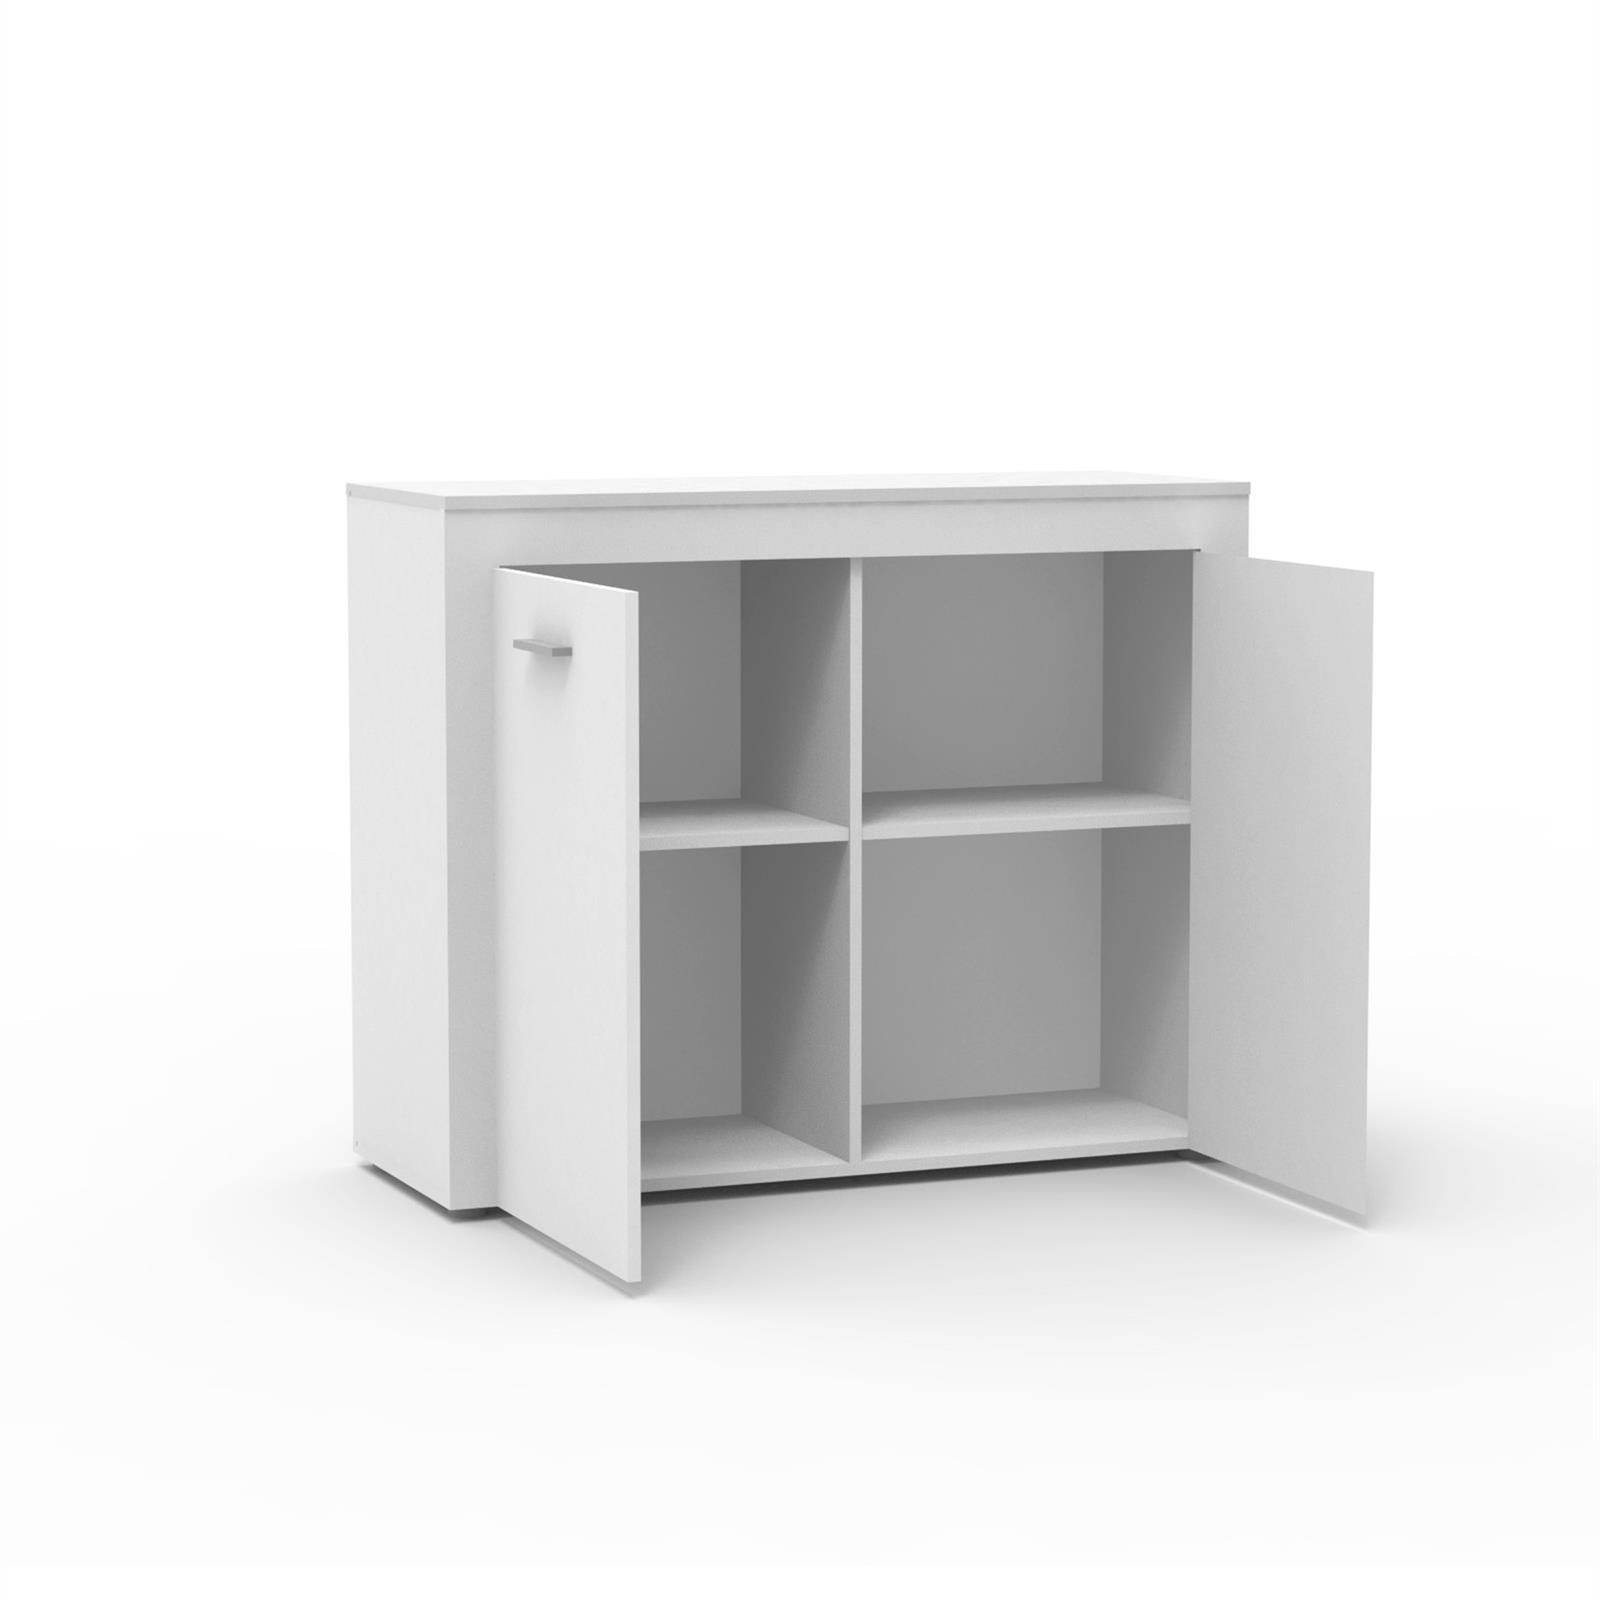 kommode sideboard highboard anrichte shabby chic sonoma eiche 110 cm 2 t ren ebay. Black Bedroom Furniture Sets. Home Design Ideas